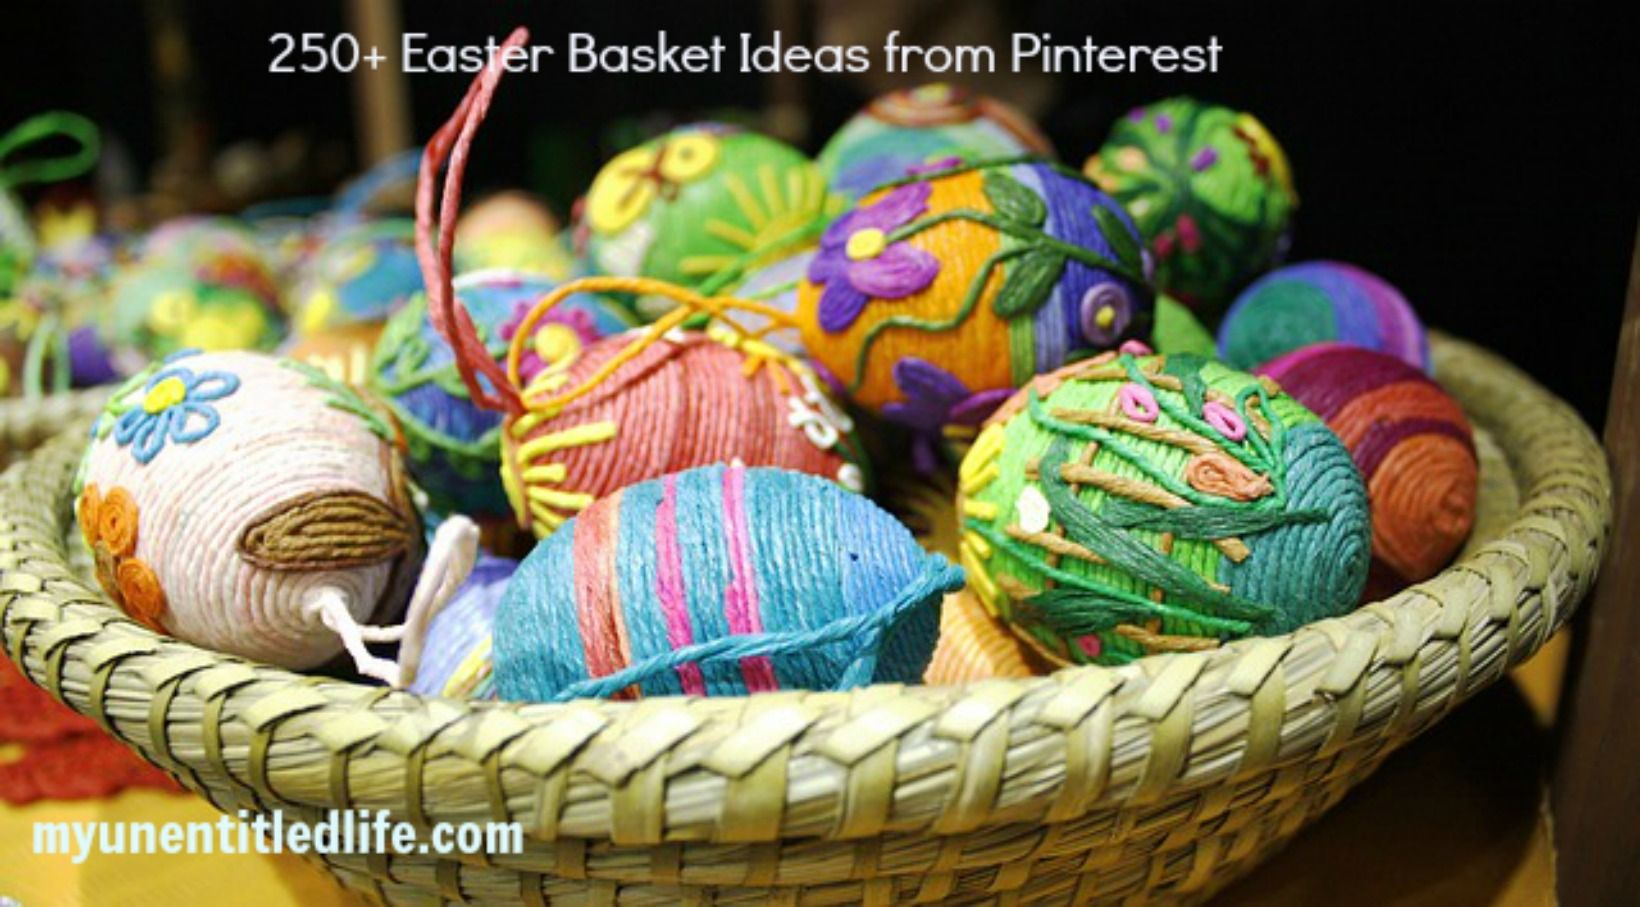 250+ Easter Basket Ideas from Pinterest